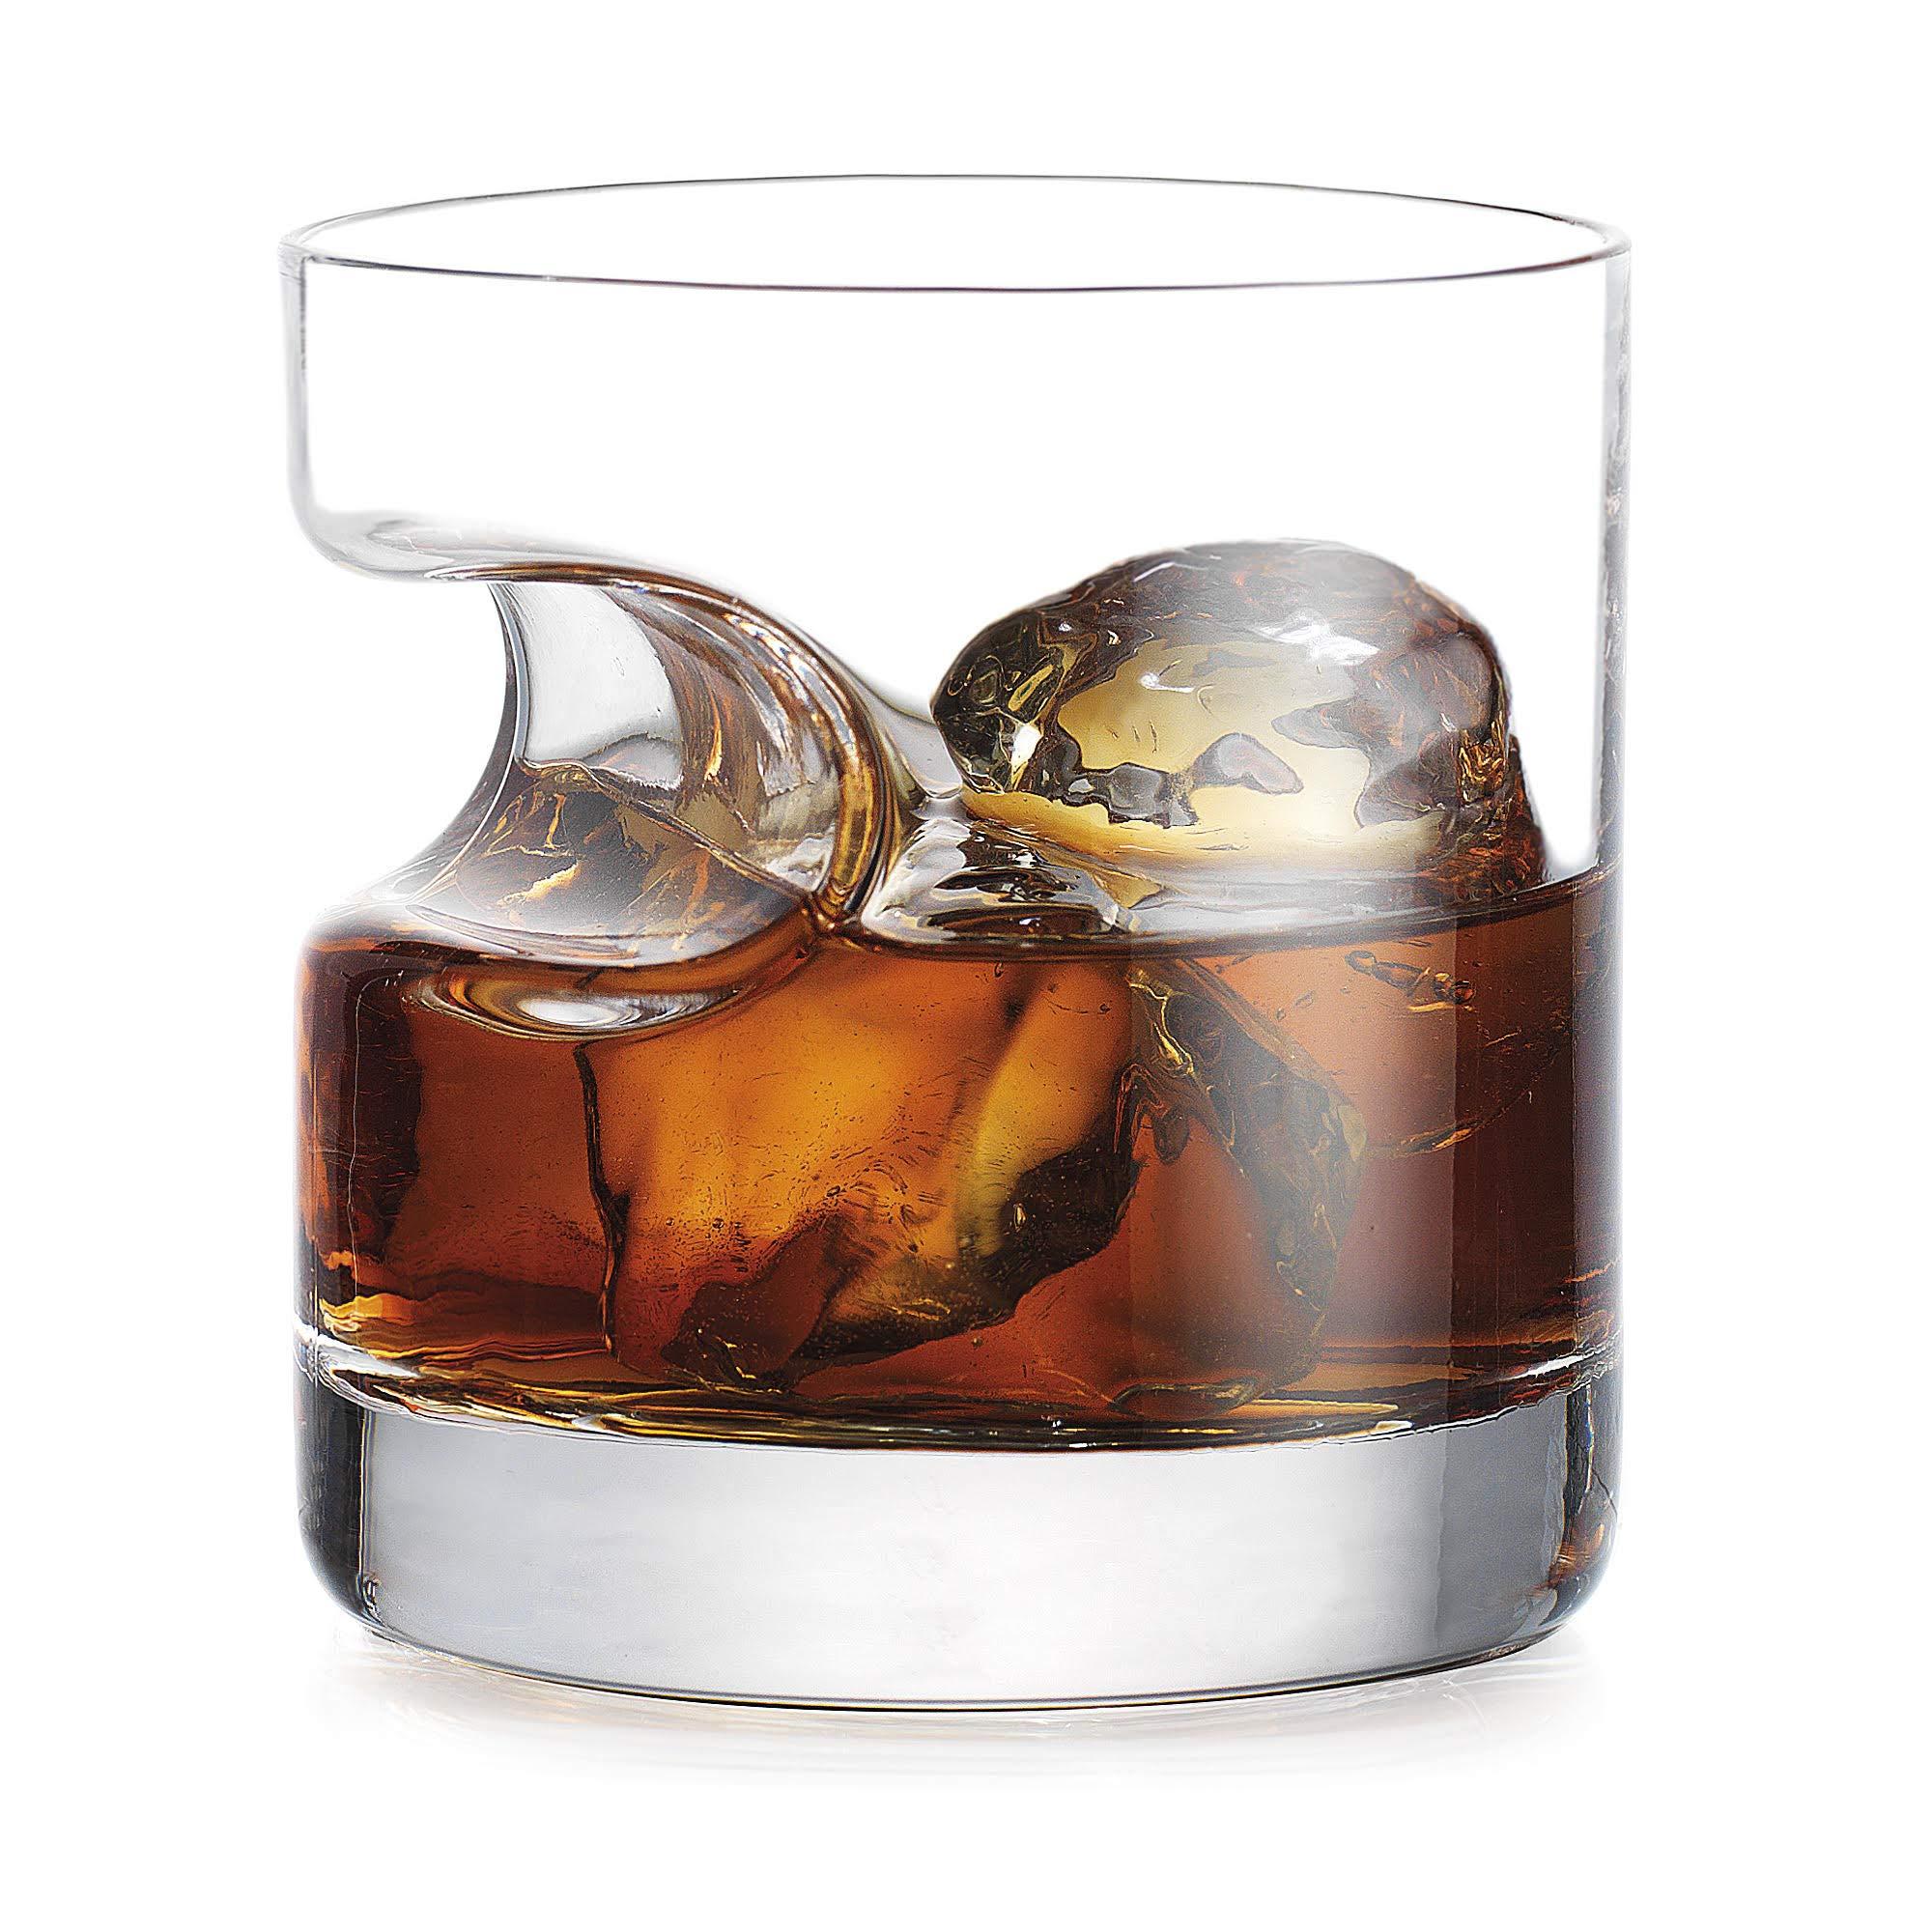 Godinger Cigar Glass - Old Fashioned Whiskey Glass With Indented Cigar Rest by Godinger (Image #2)